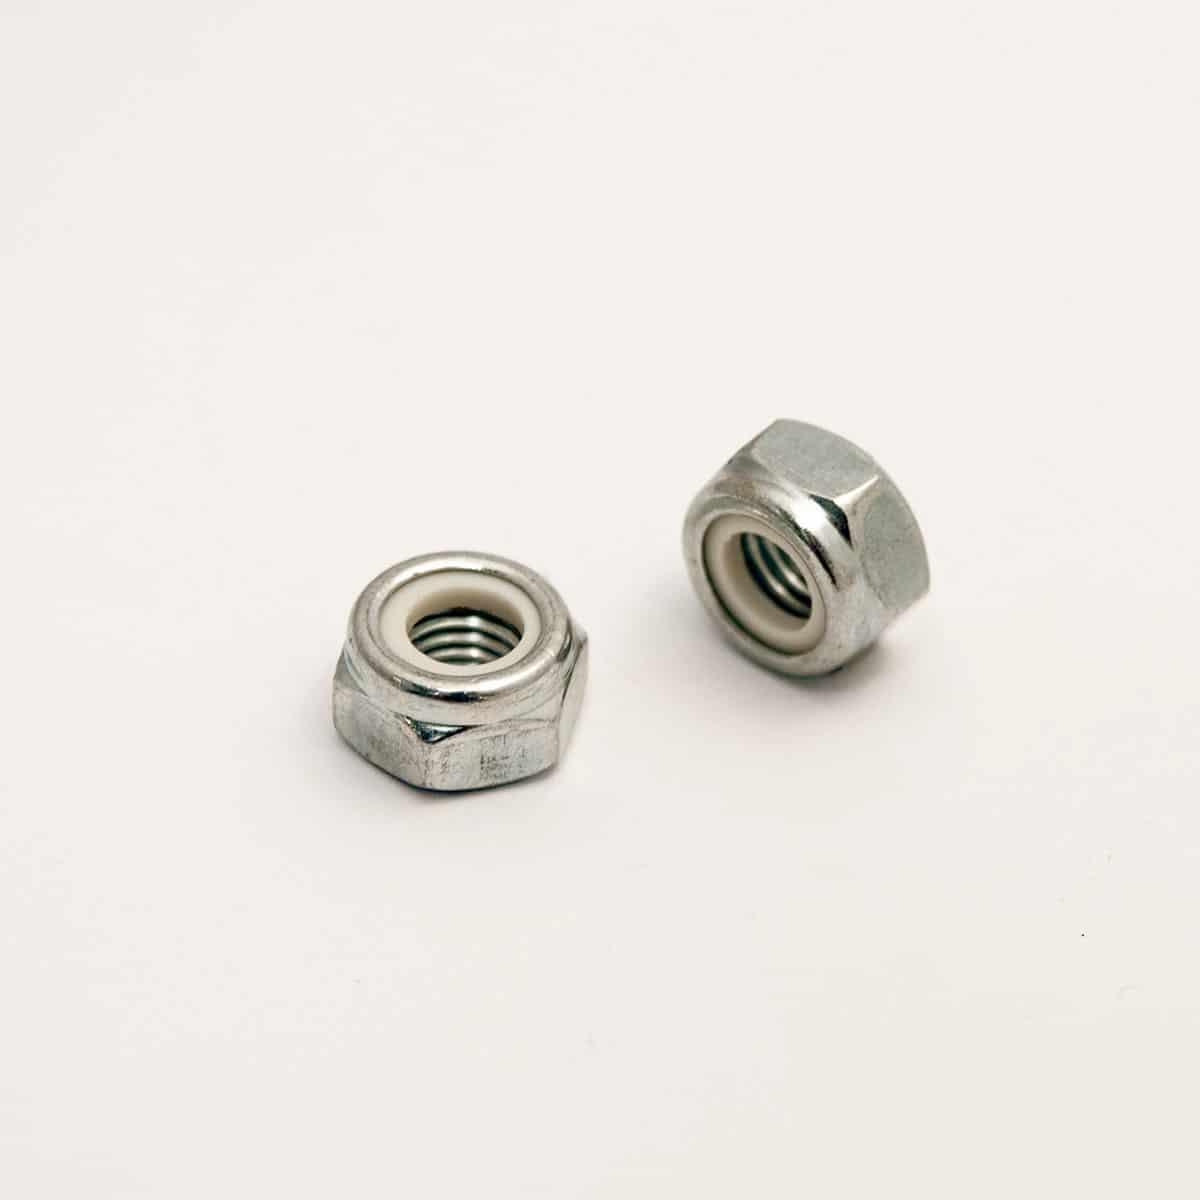 Short selfblocking hexagonal nuts